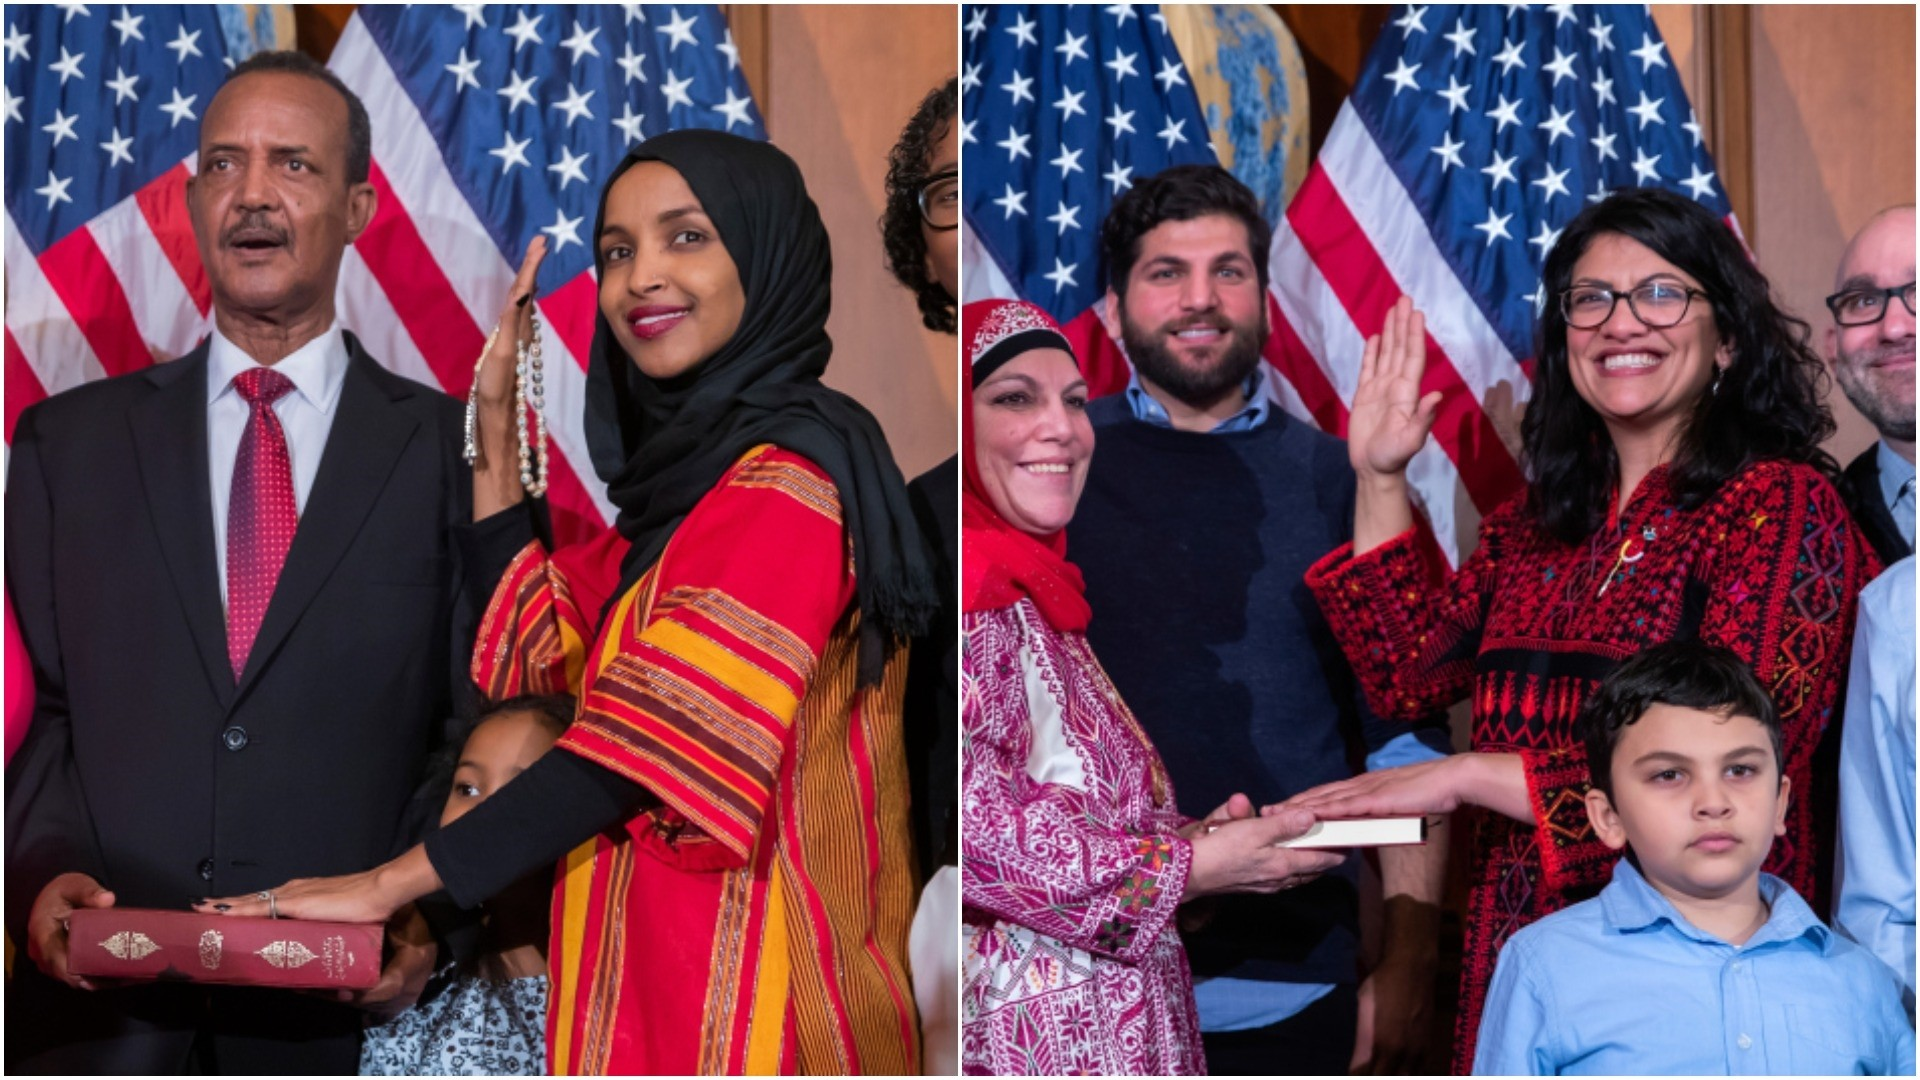 Ilhan Omar (L) and Rashida Tlaib (R) take their oaths of office. (EPA/AA Photos)